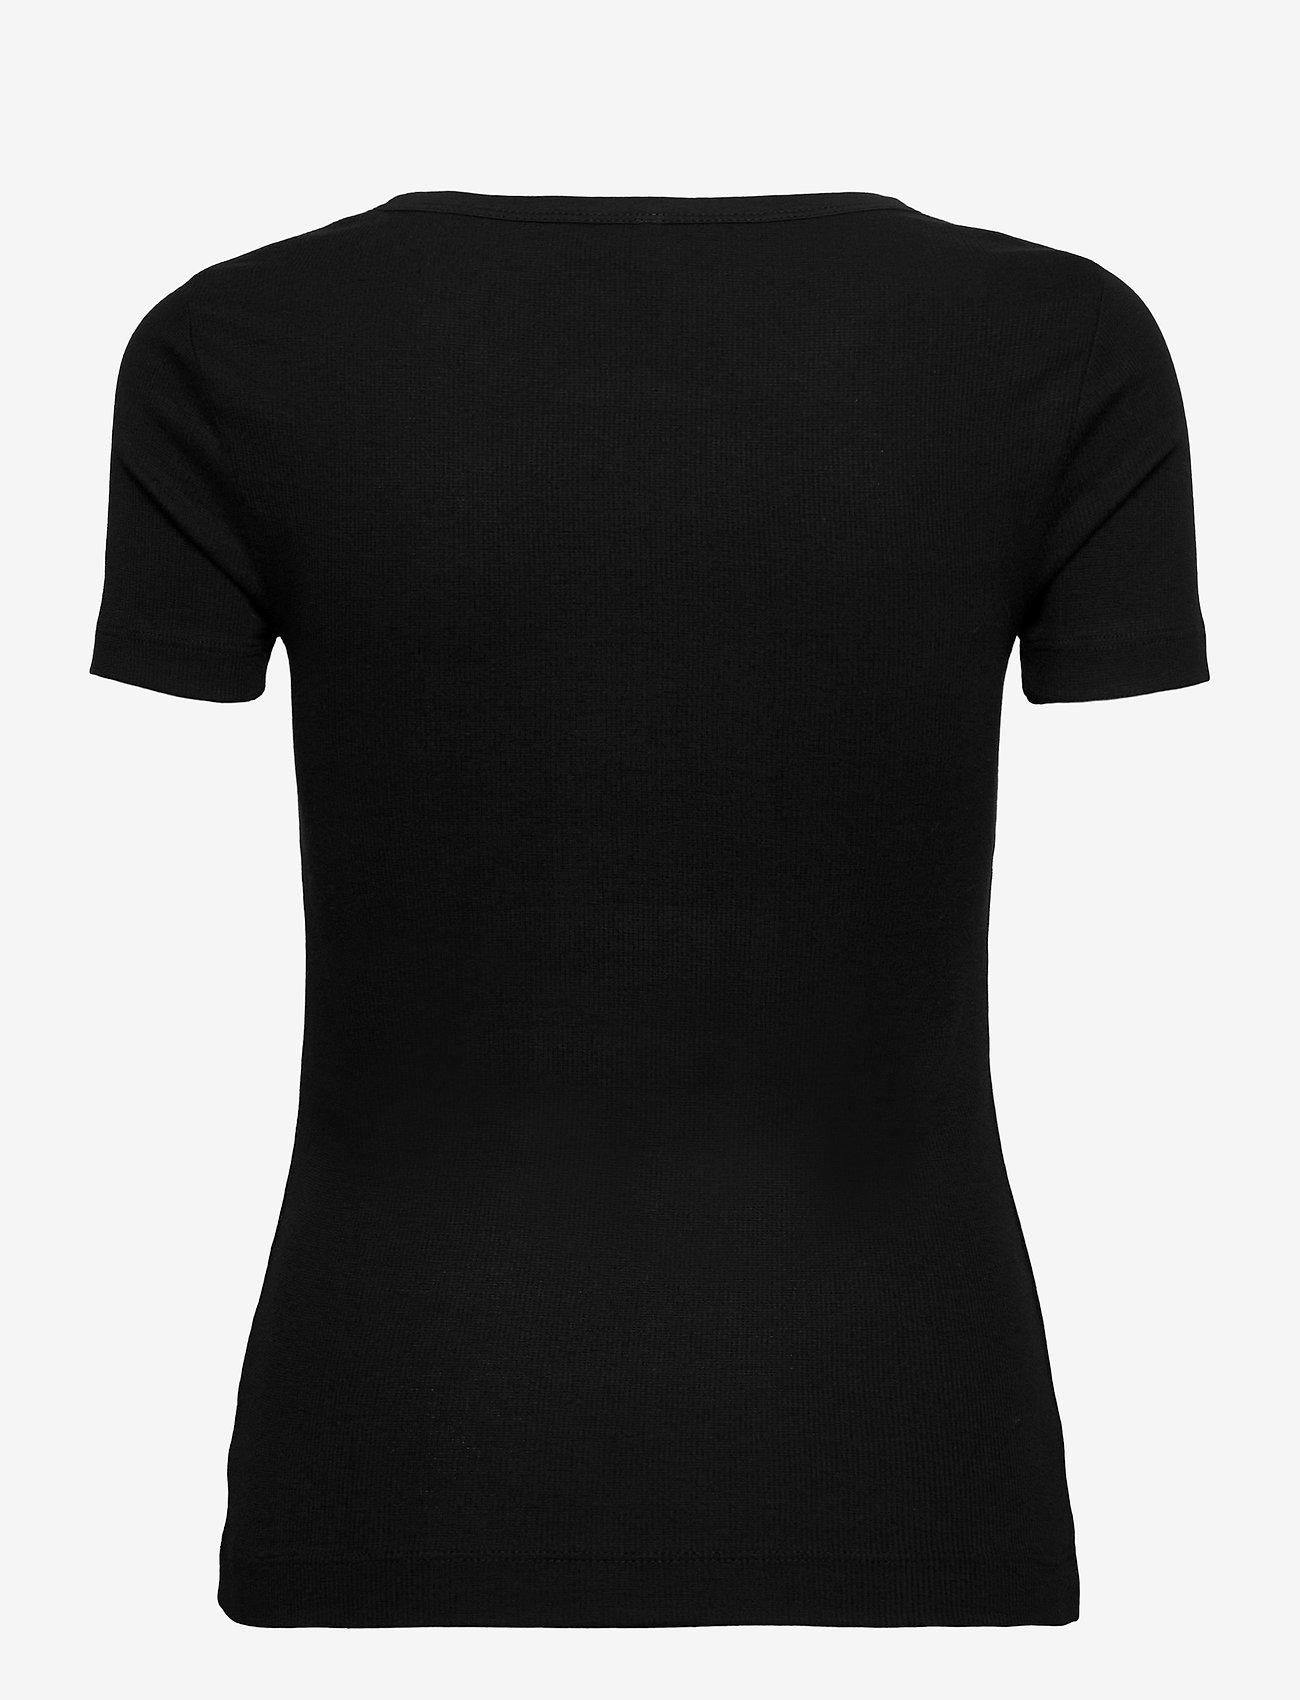 Tommy Hilfiger - TH ESS SKINNY OPEN-NK RIB TOP SS - t-shirts - black - 1